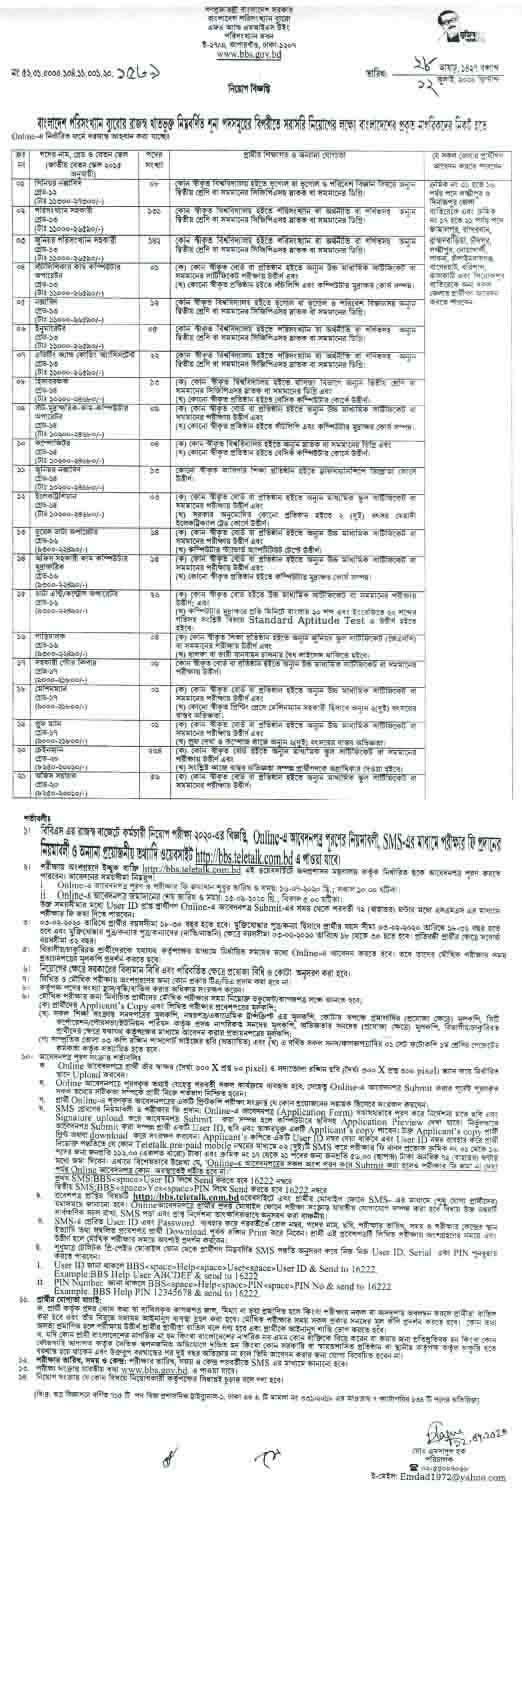 bangladesh bureau of statistic bbs govt job circular 2020